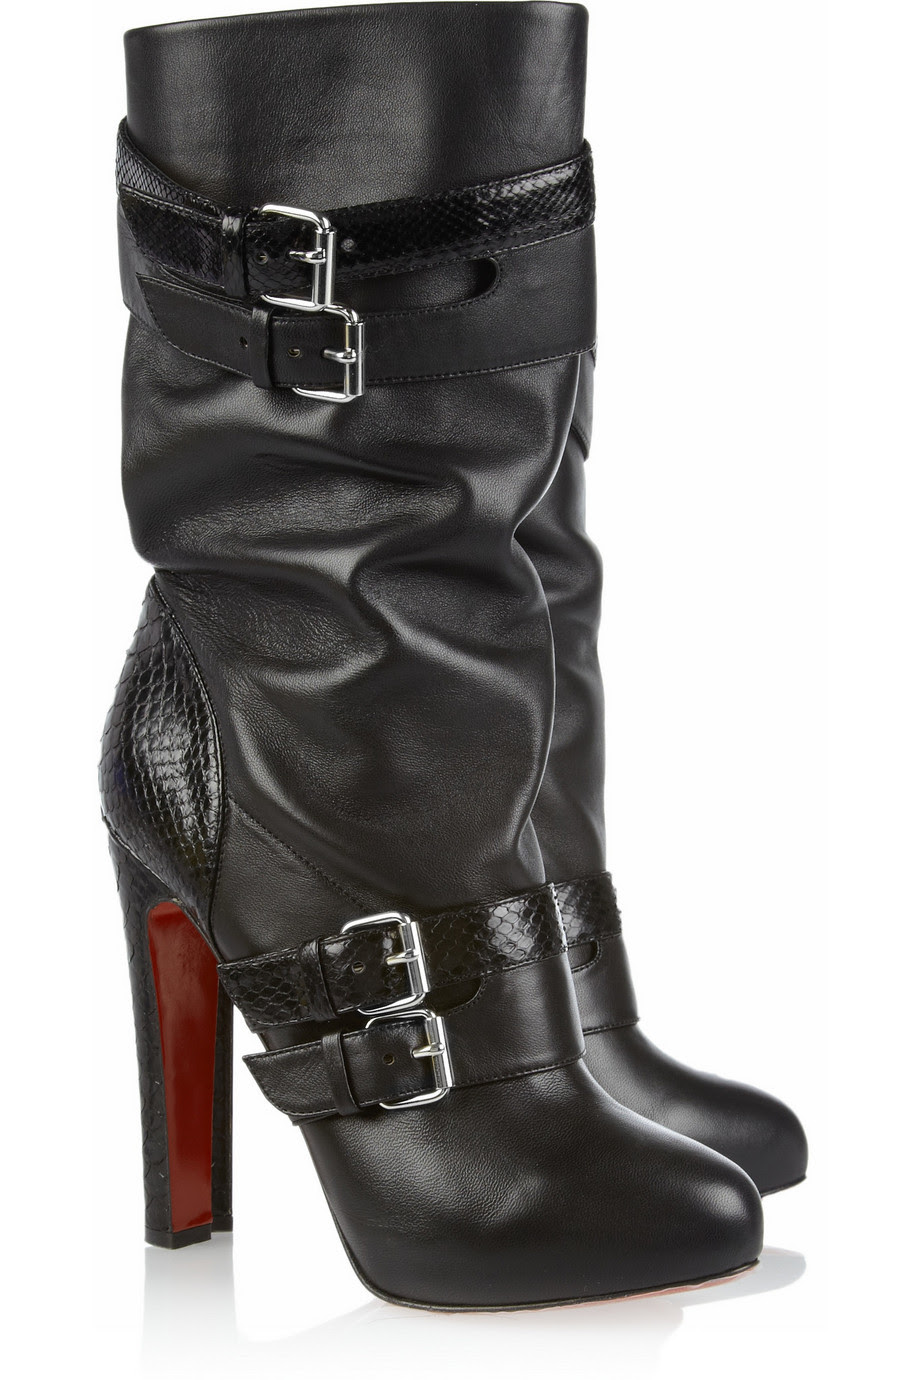 Used Christian Louboutin Shoes Men